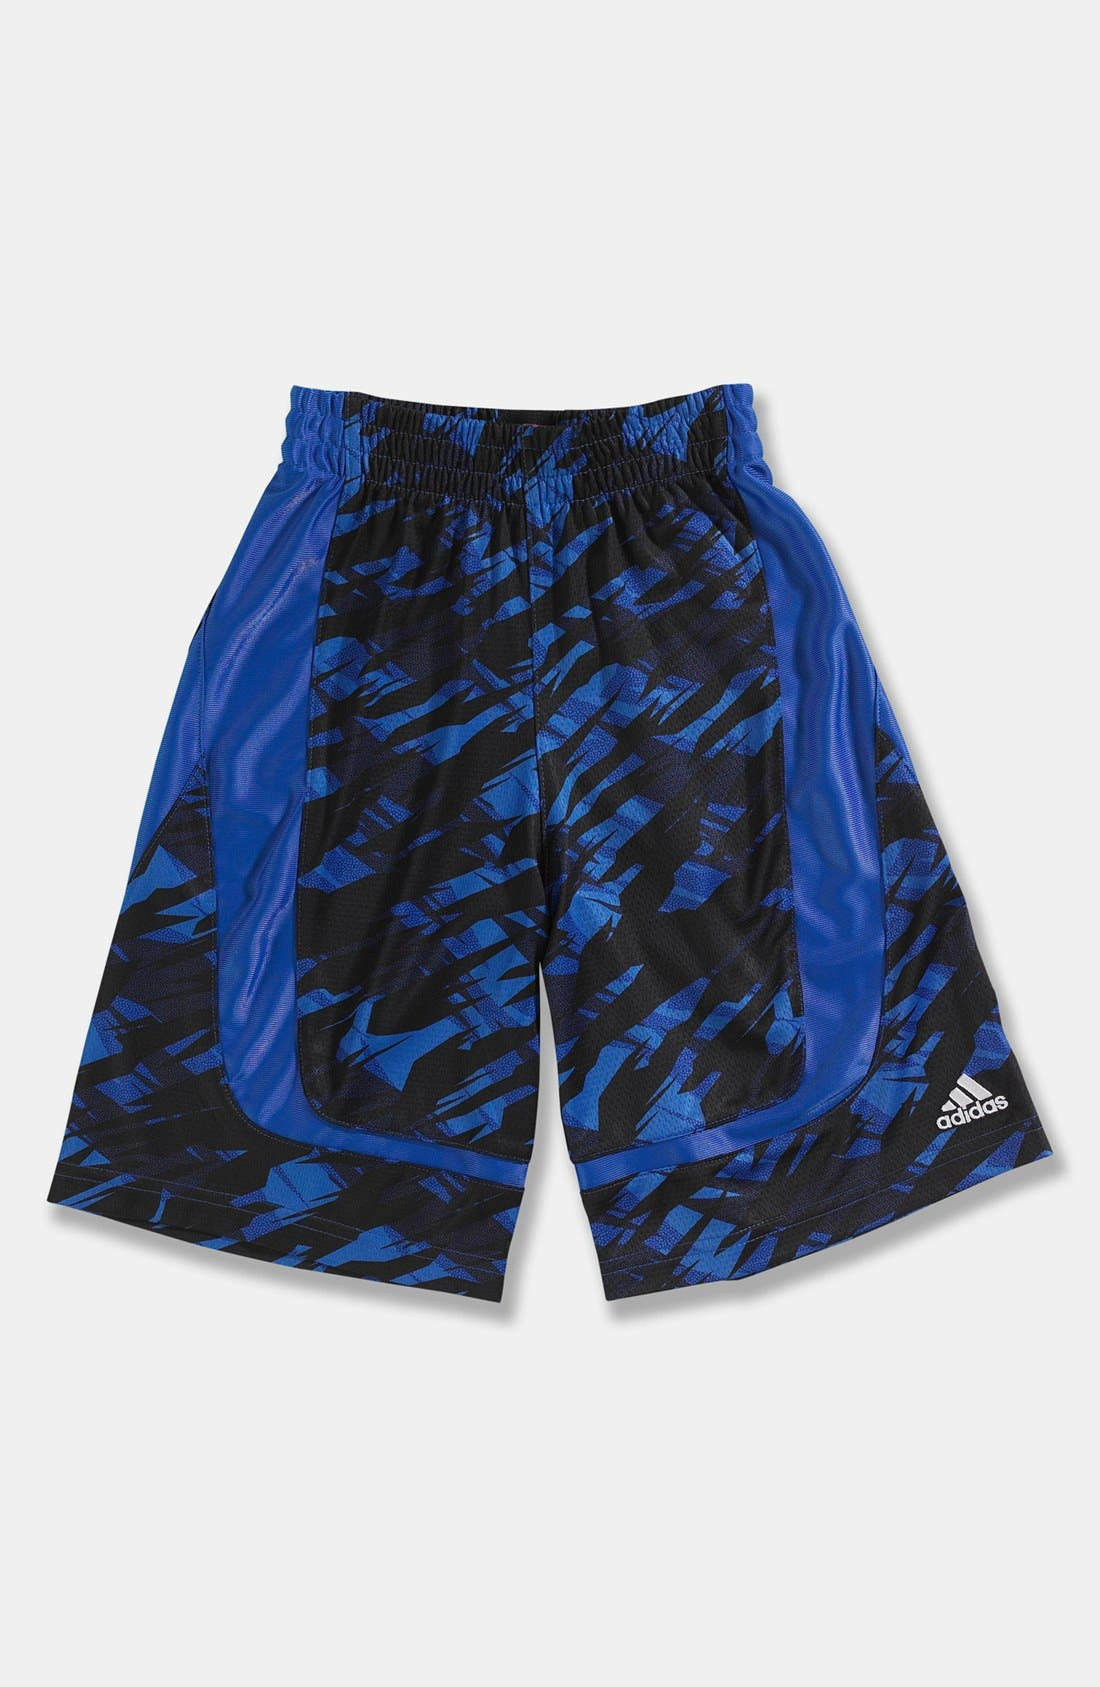 Alternate Image 1 Selected - adidas 'Impact Camo' Court Shorts (Little Boys)